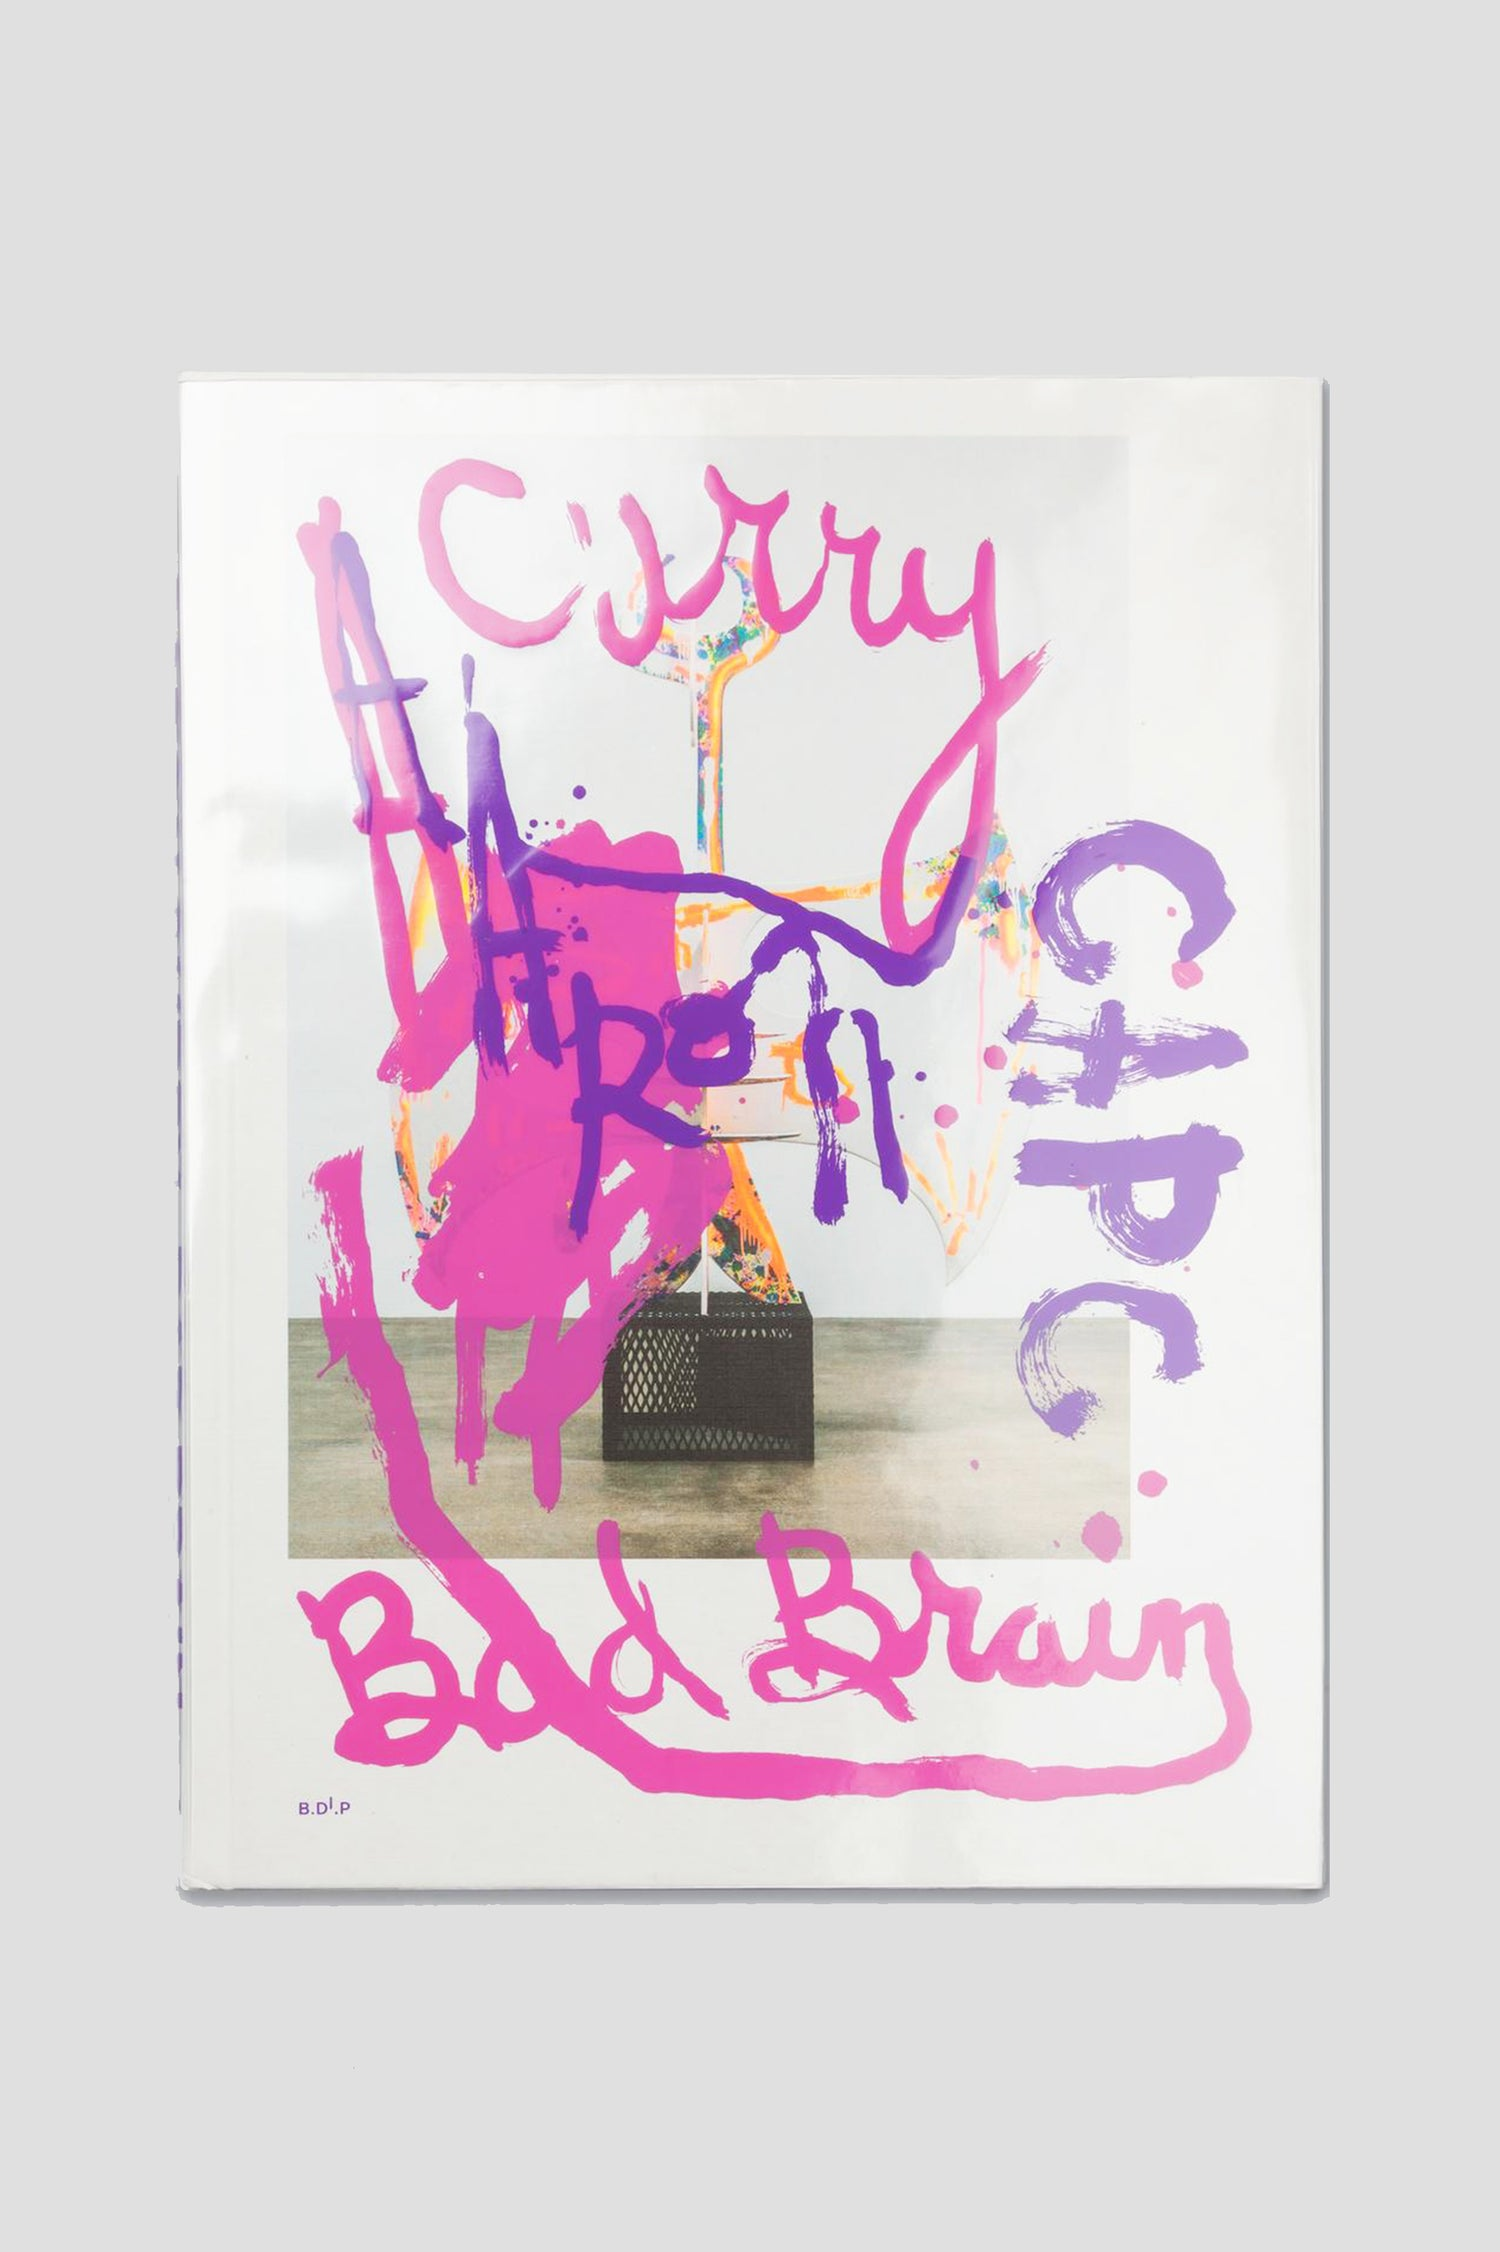 Image of Aaron Curry - Bad Brain